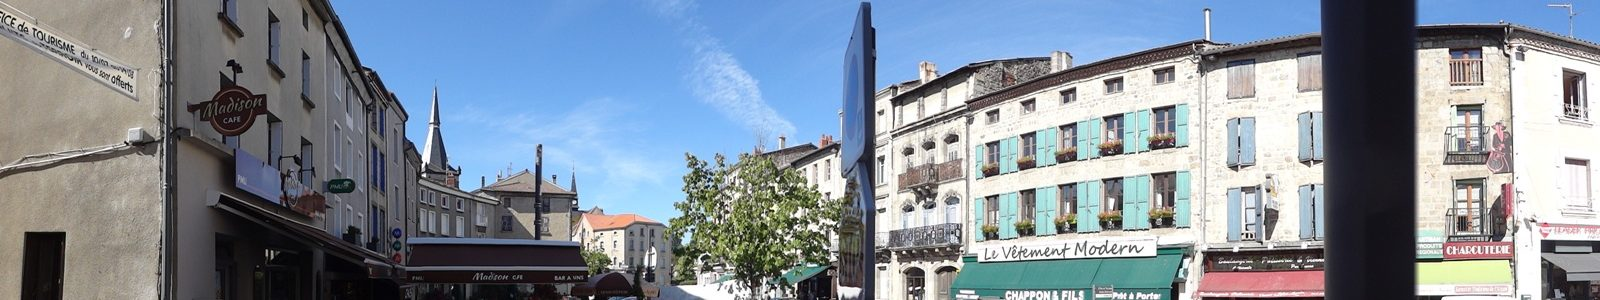 Faubourg Constant - Vue panoramique